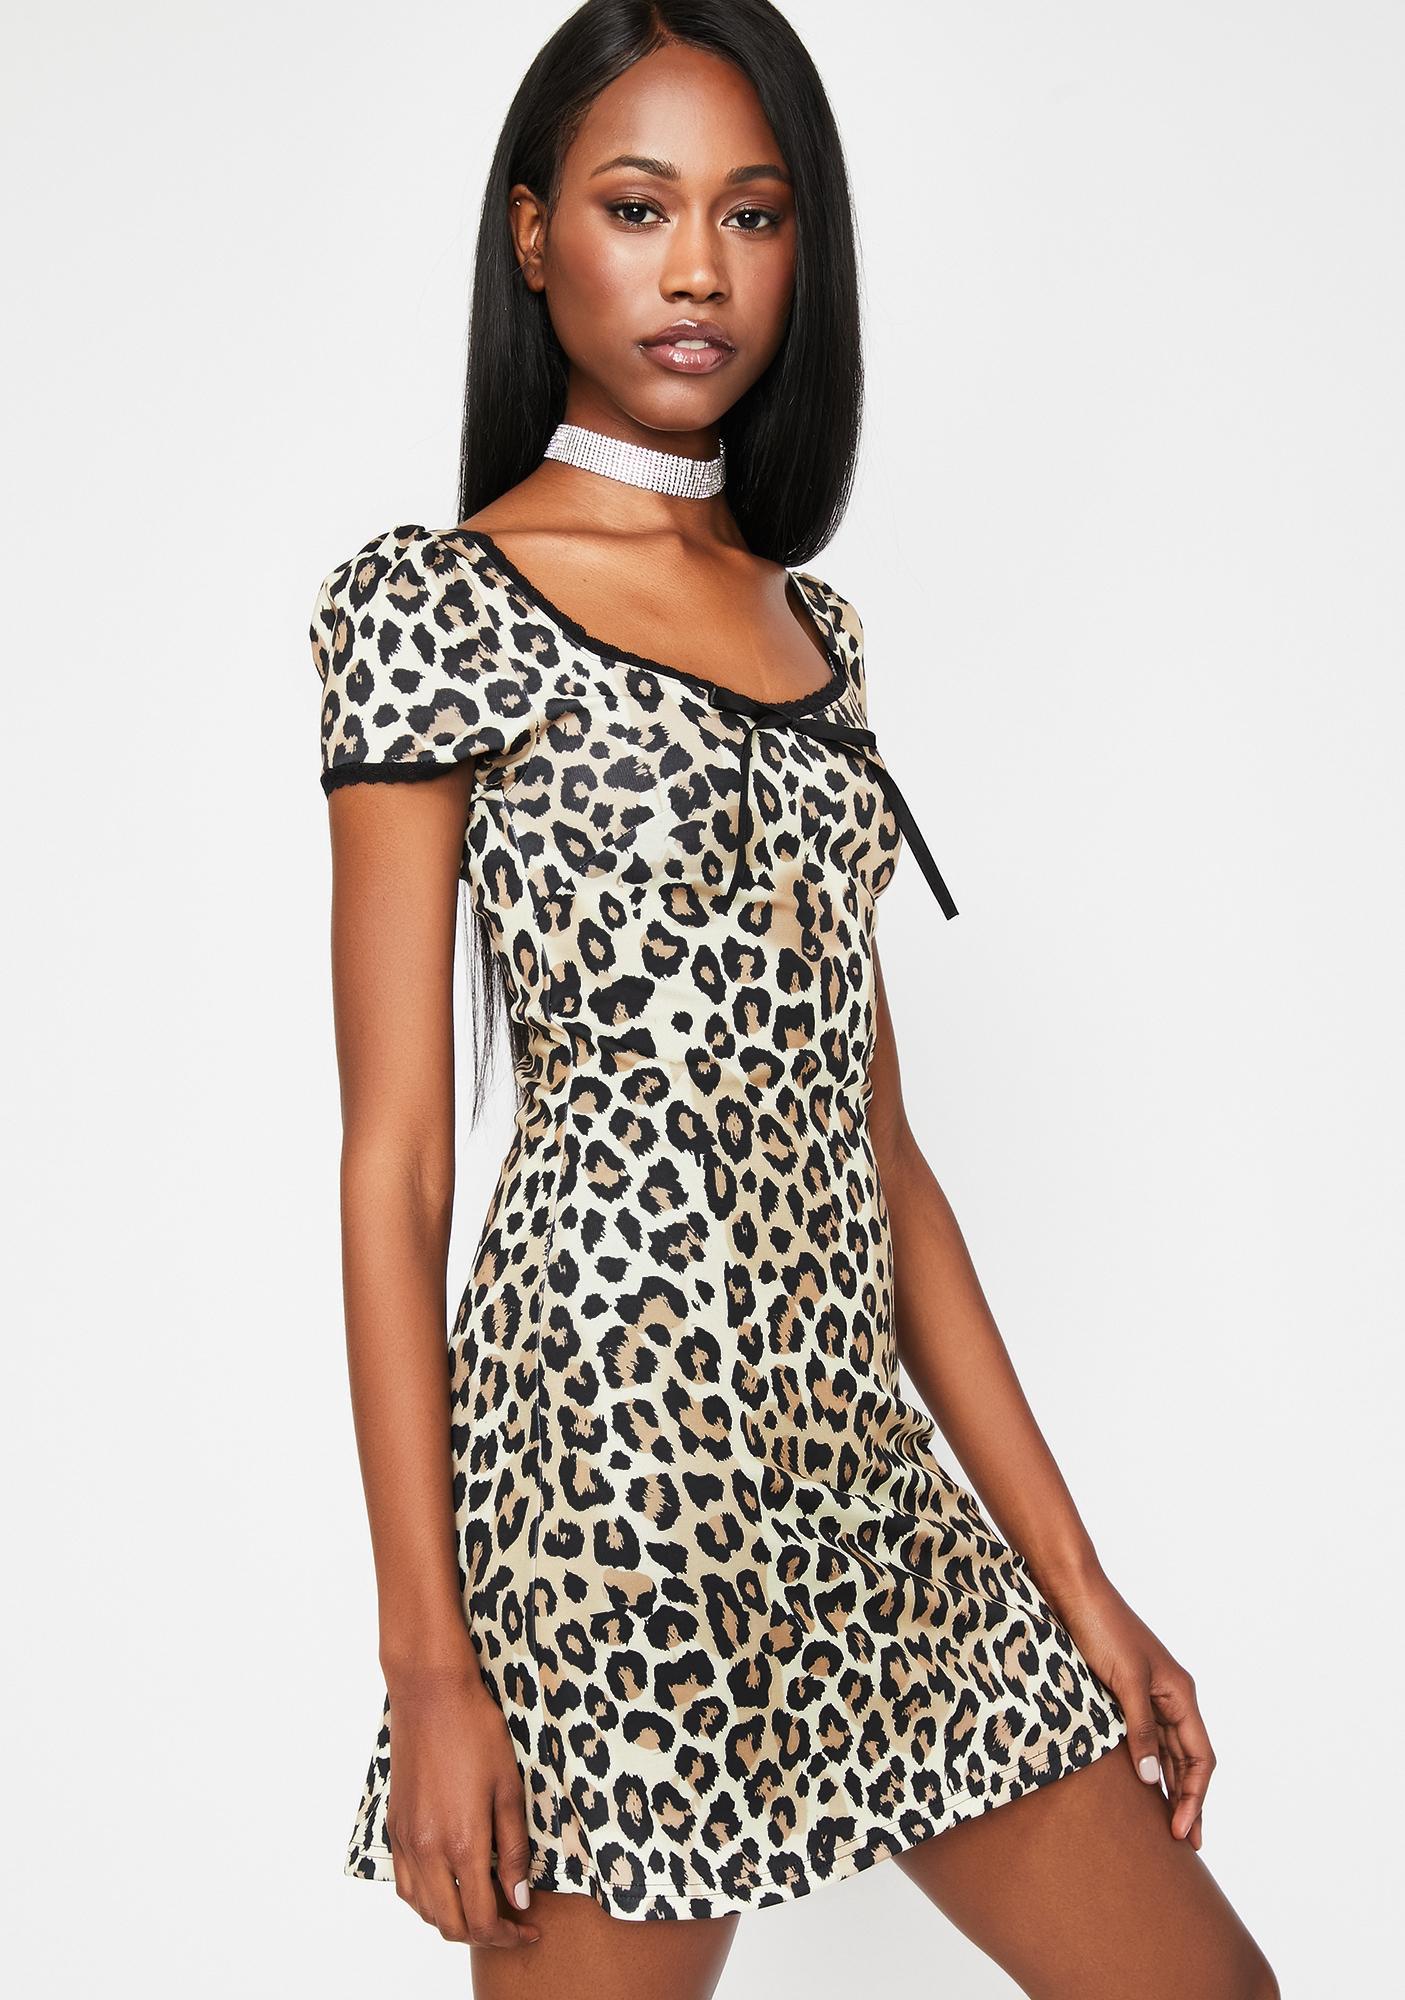 HOROSCOPEZ Feline Constellation Dress